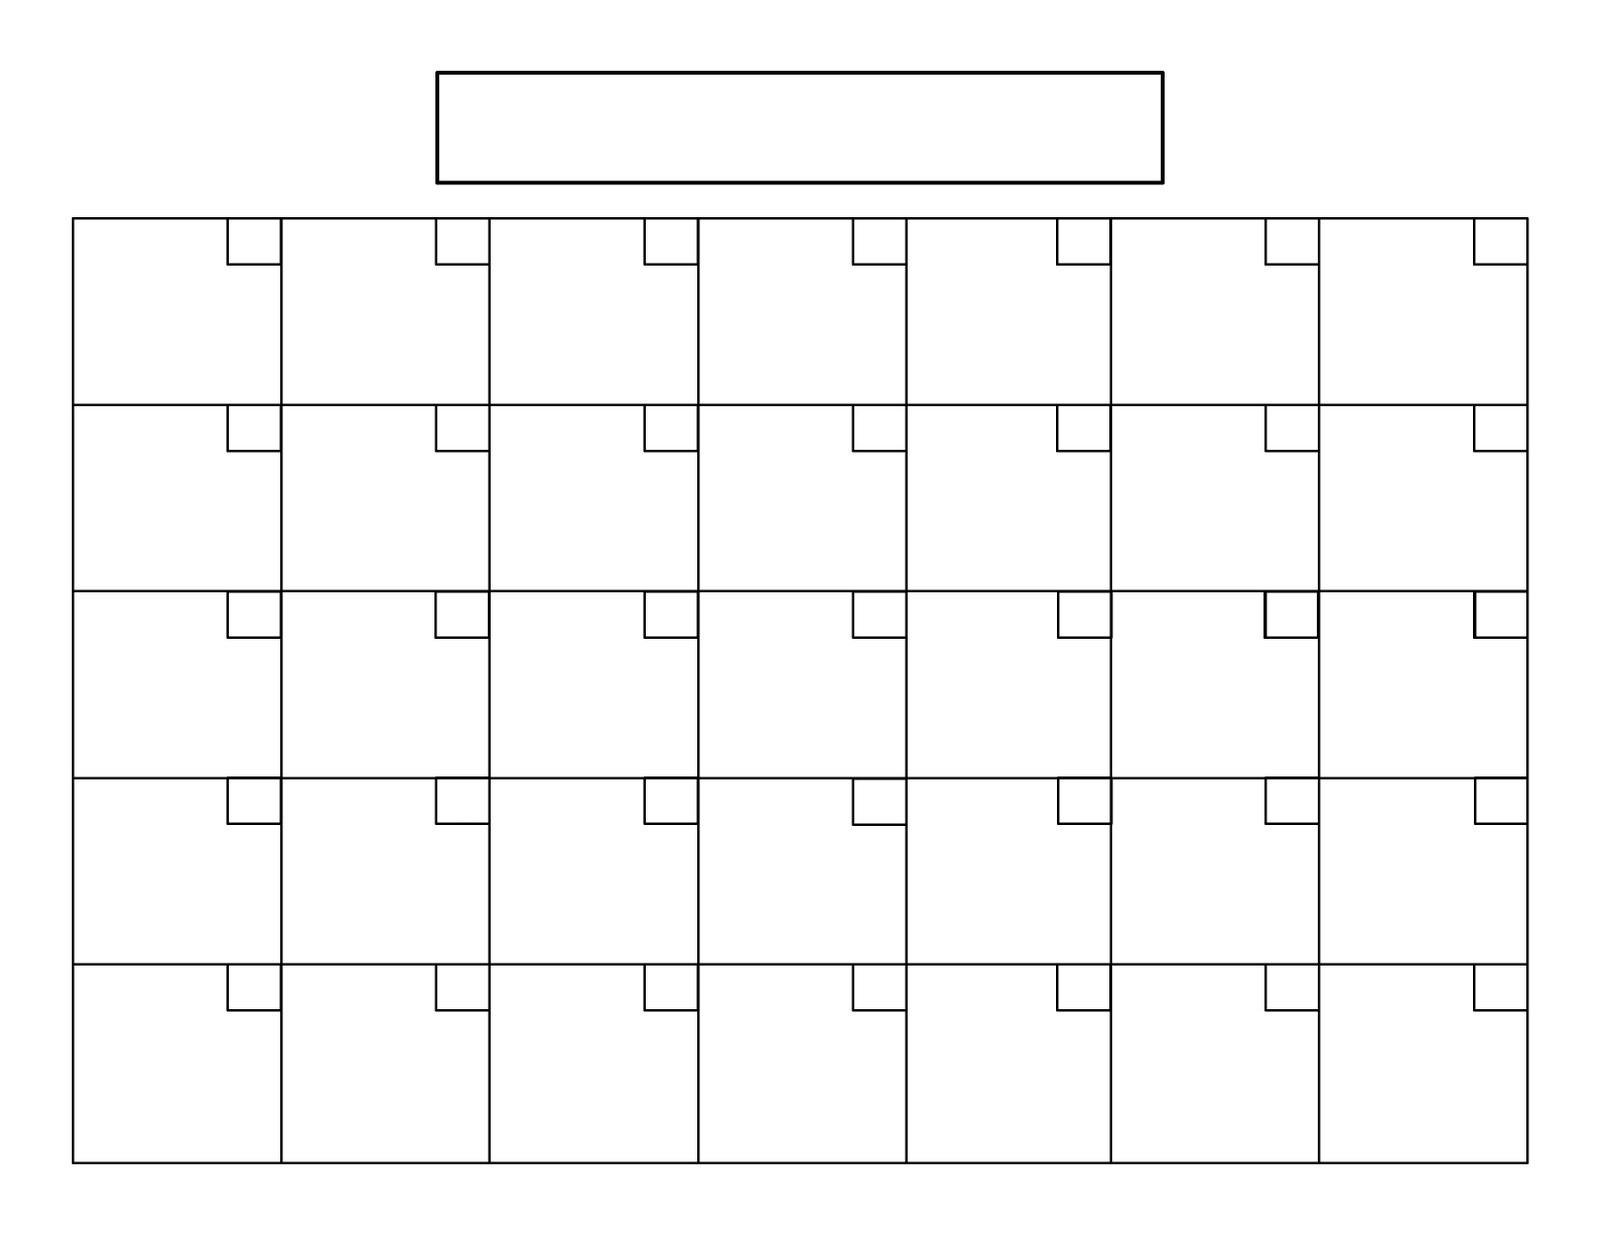 7 Images of Printable Blank 8 X 11 Calendar Grid Template